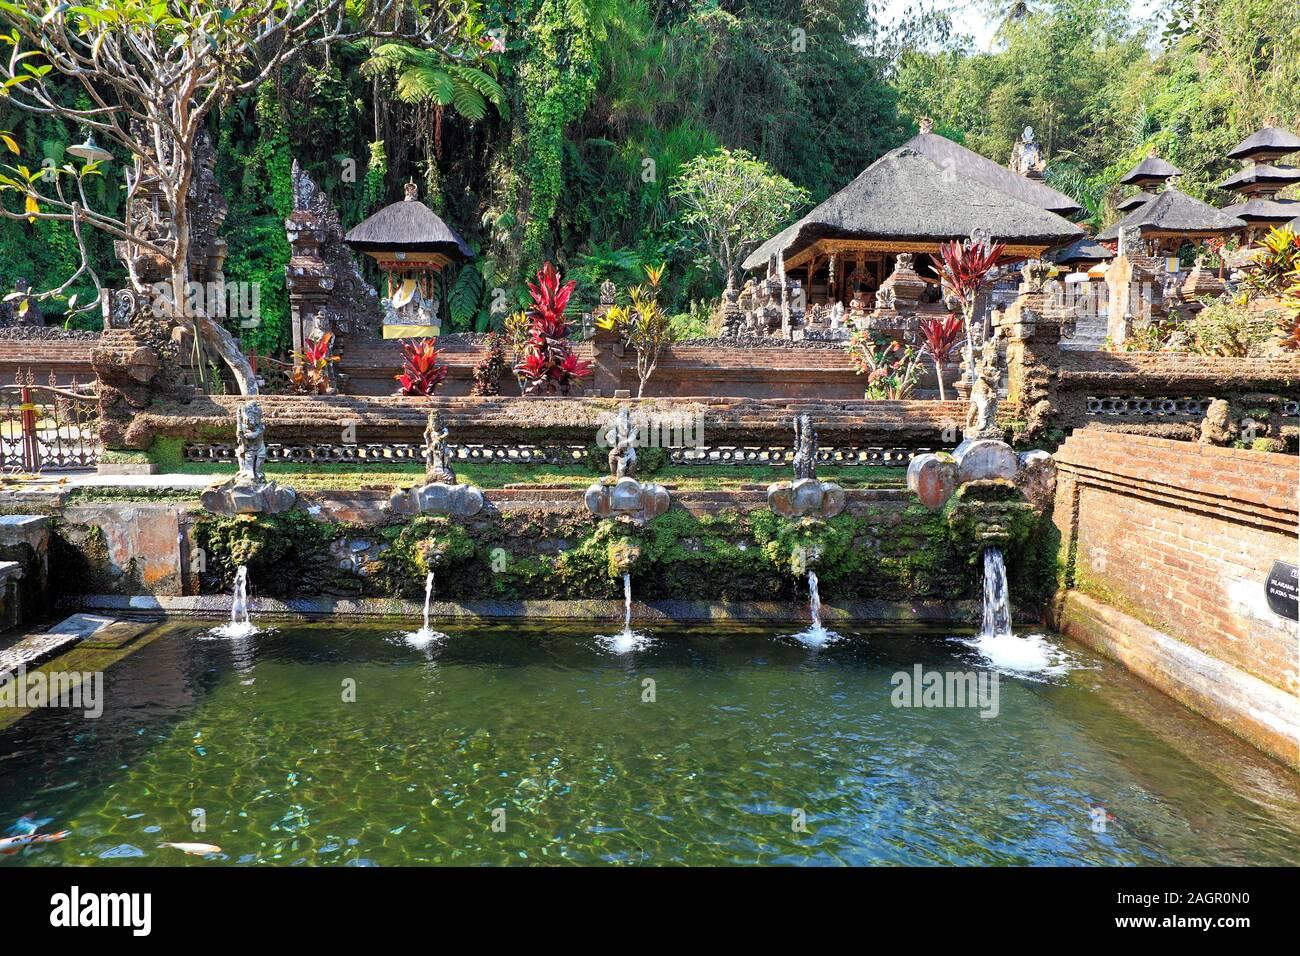 one-of-seven-pools-offering-holy-water-or-bathing-at-pura-gunung-kawi-sebatu-temple-tegallelang-near-ubud-bali-indonesia-2AGR0N0.jpg